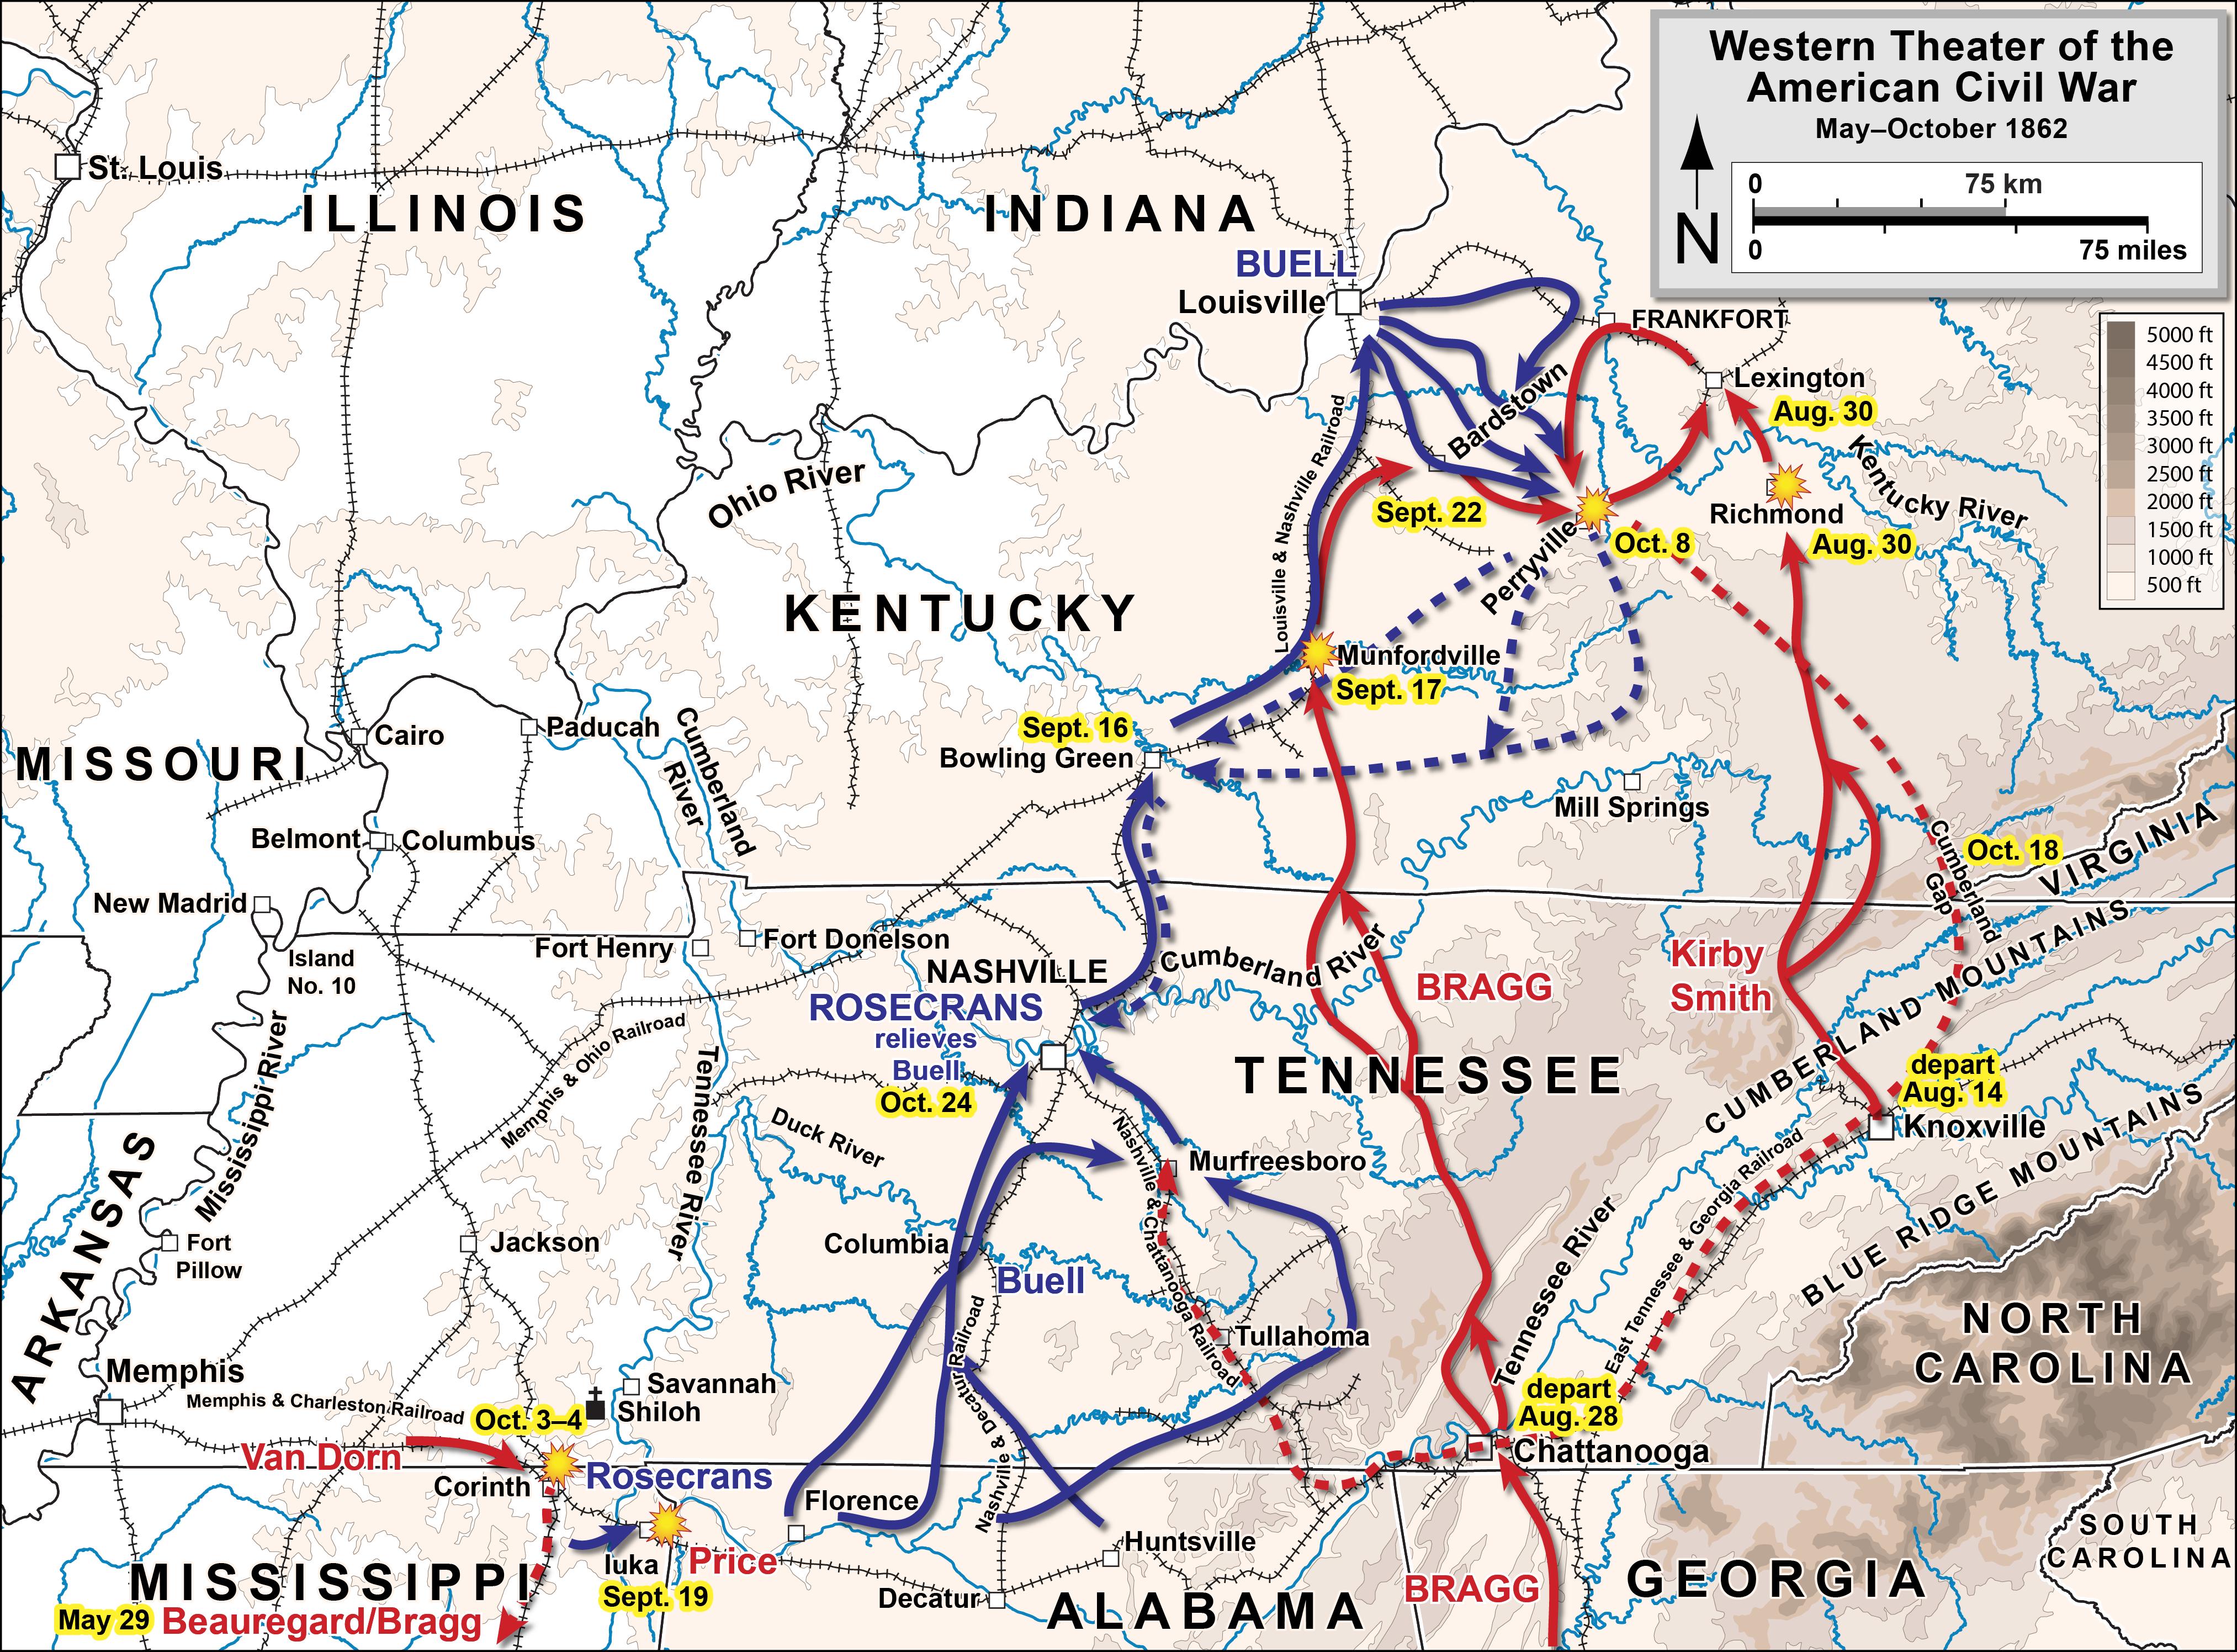 Confederate land Offensive - Wikipedia on tn gis civil war, the battle of malvern hill civil war, seven days campaign civil war, bowling green civil war,